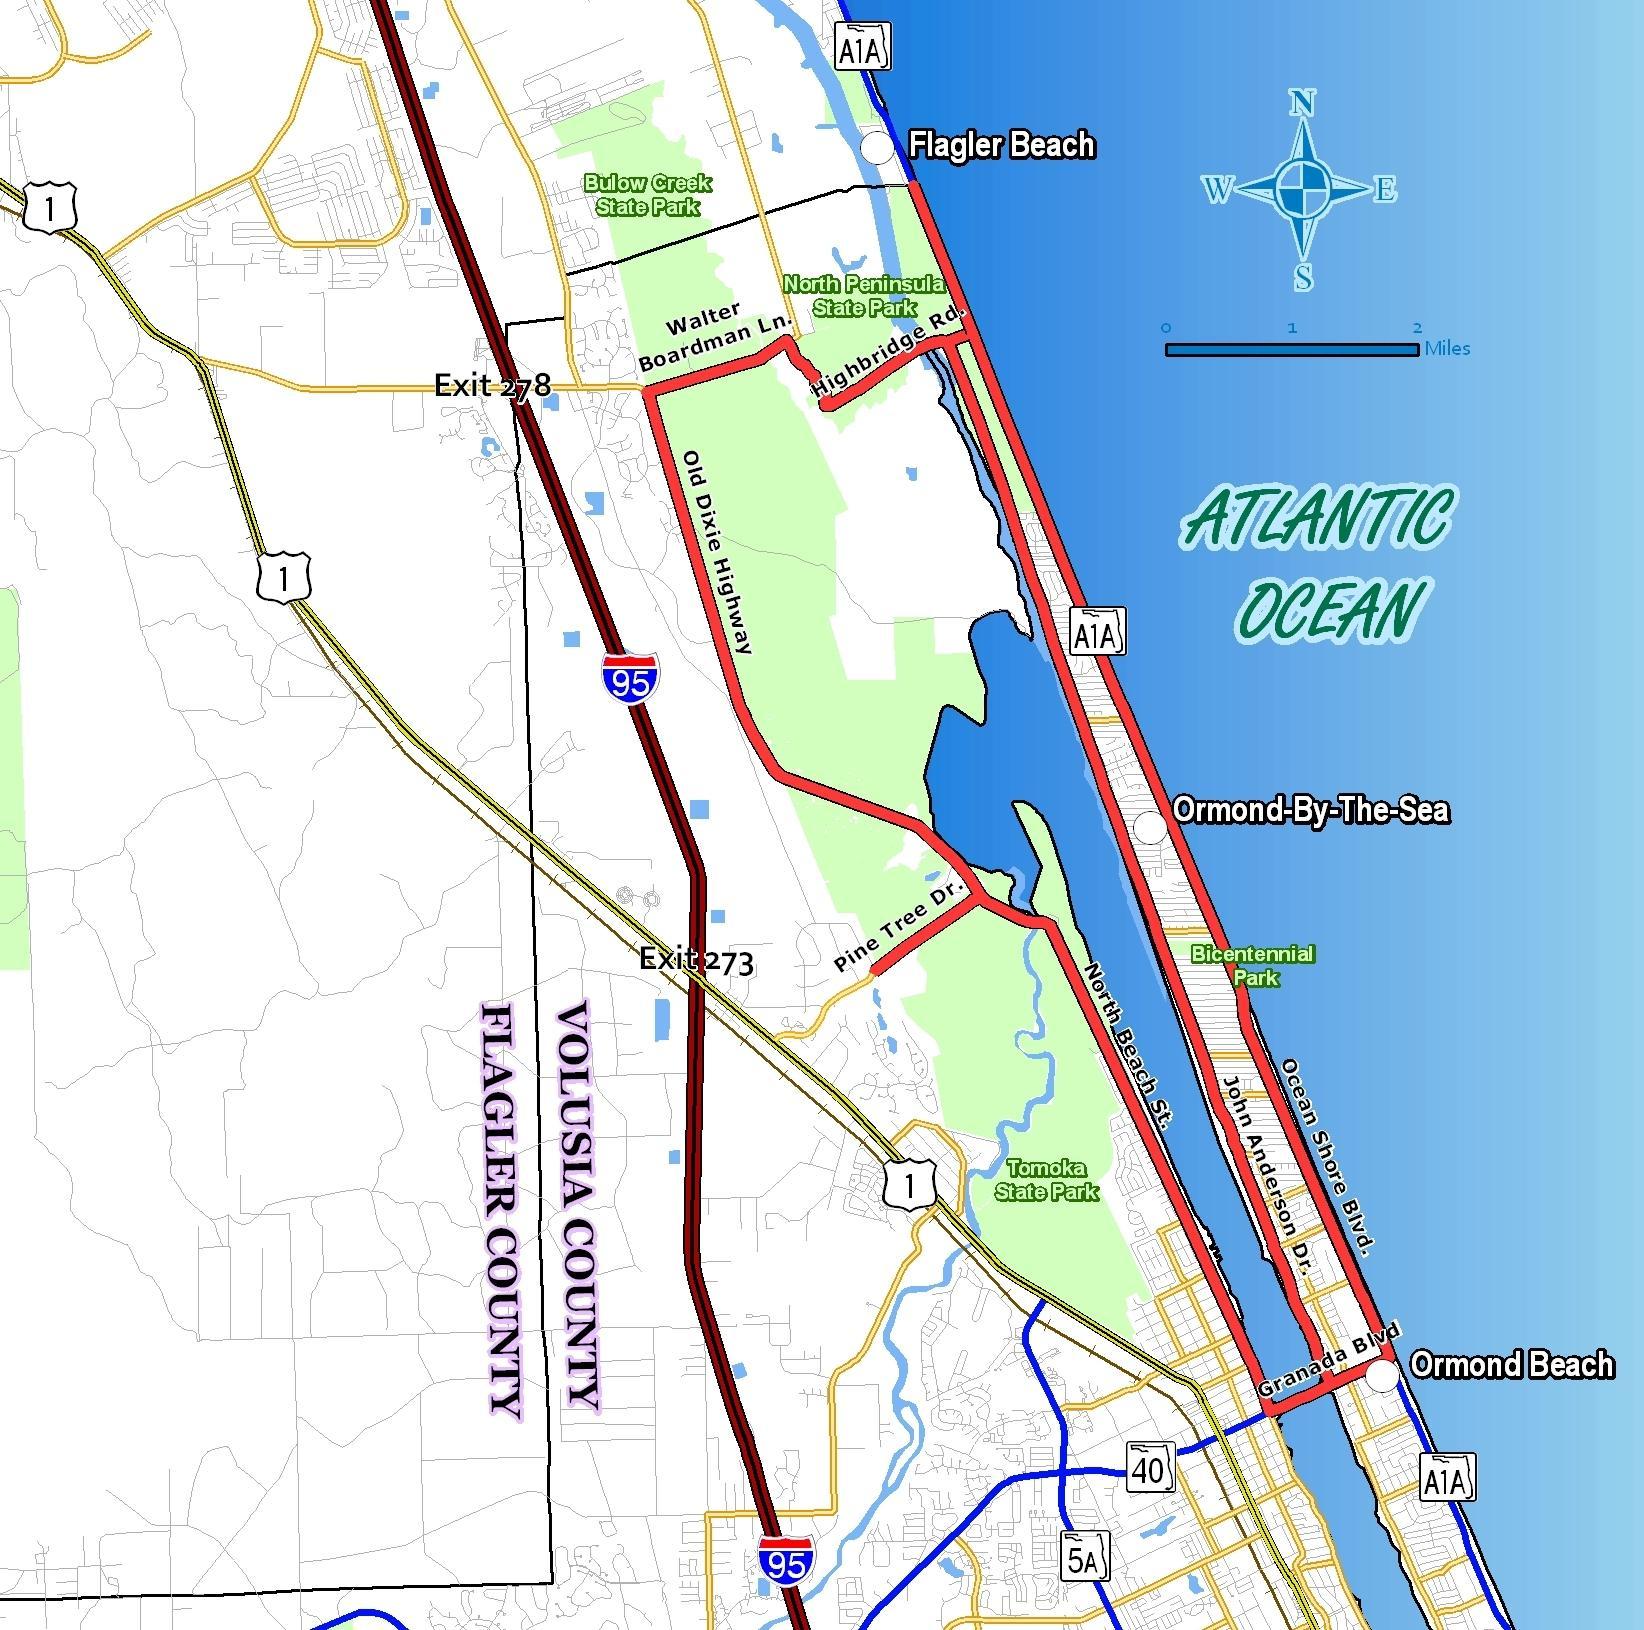 Daytona Beach Map From Ormondscenicloopandtrail 5 - Ameliabd - Map Of Daytona Beach Florida